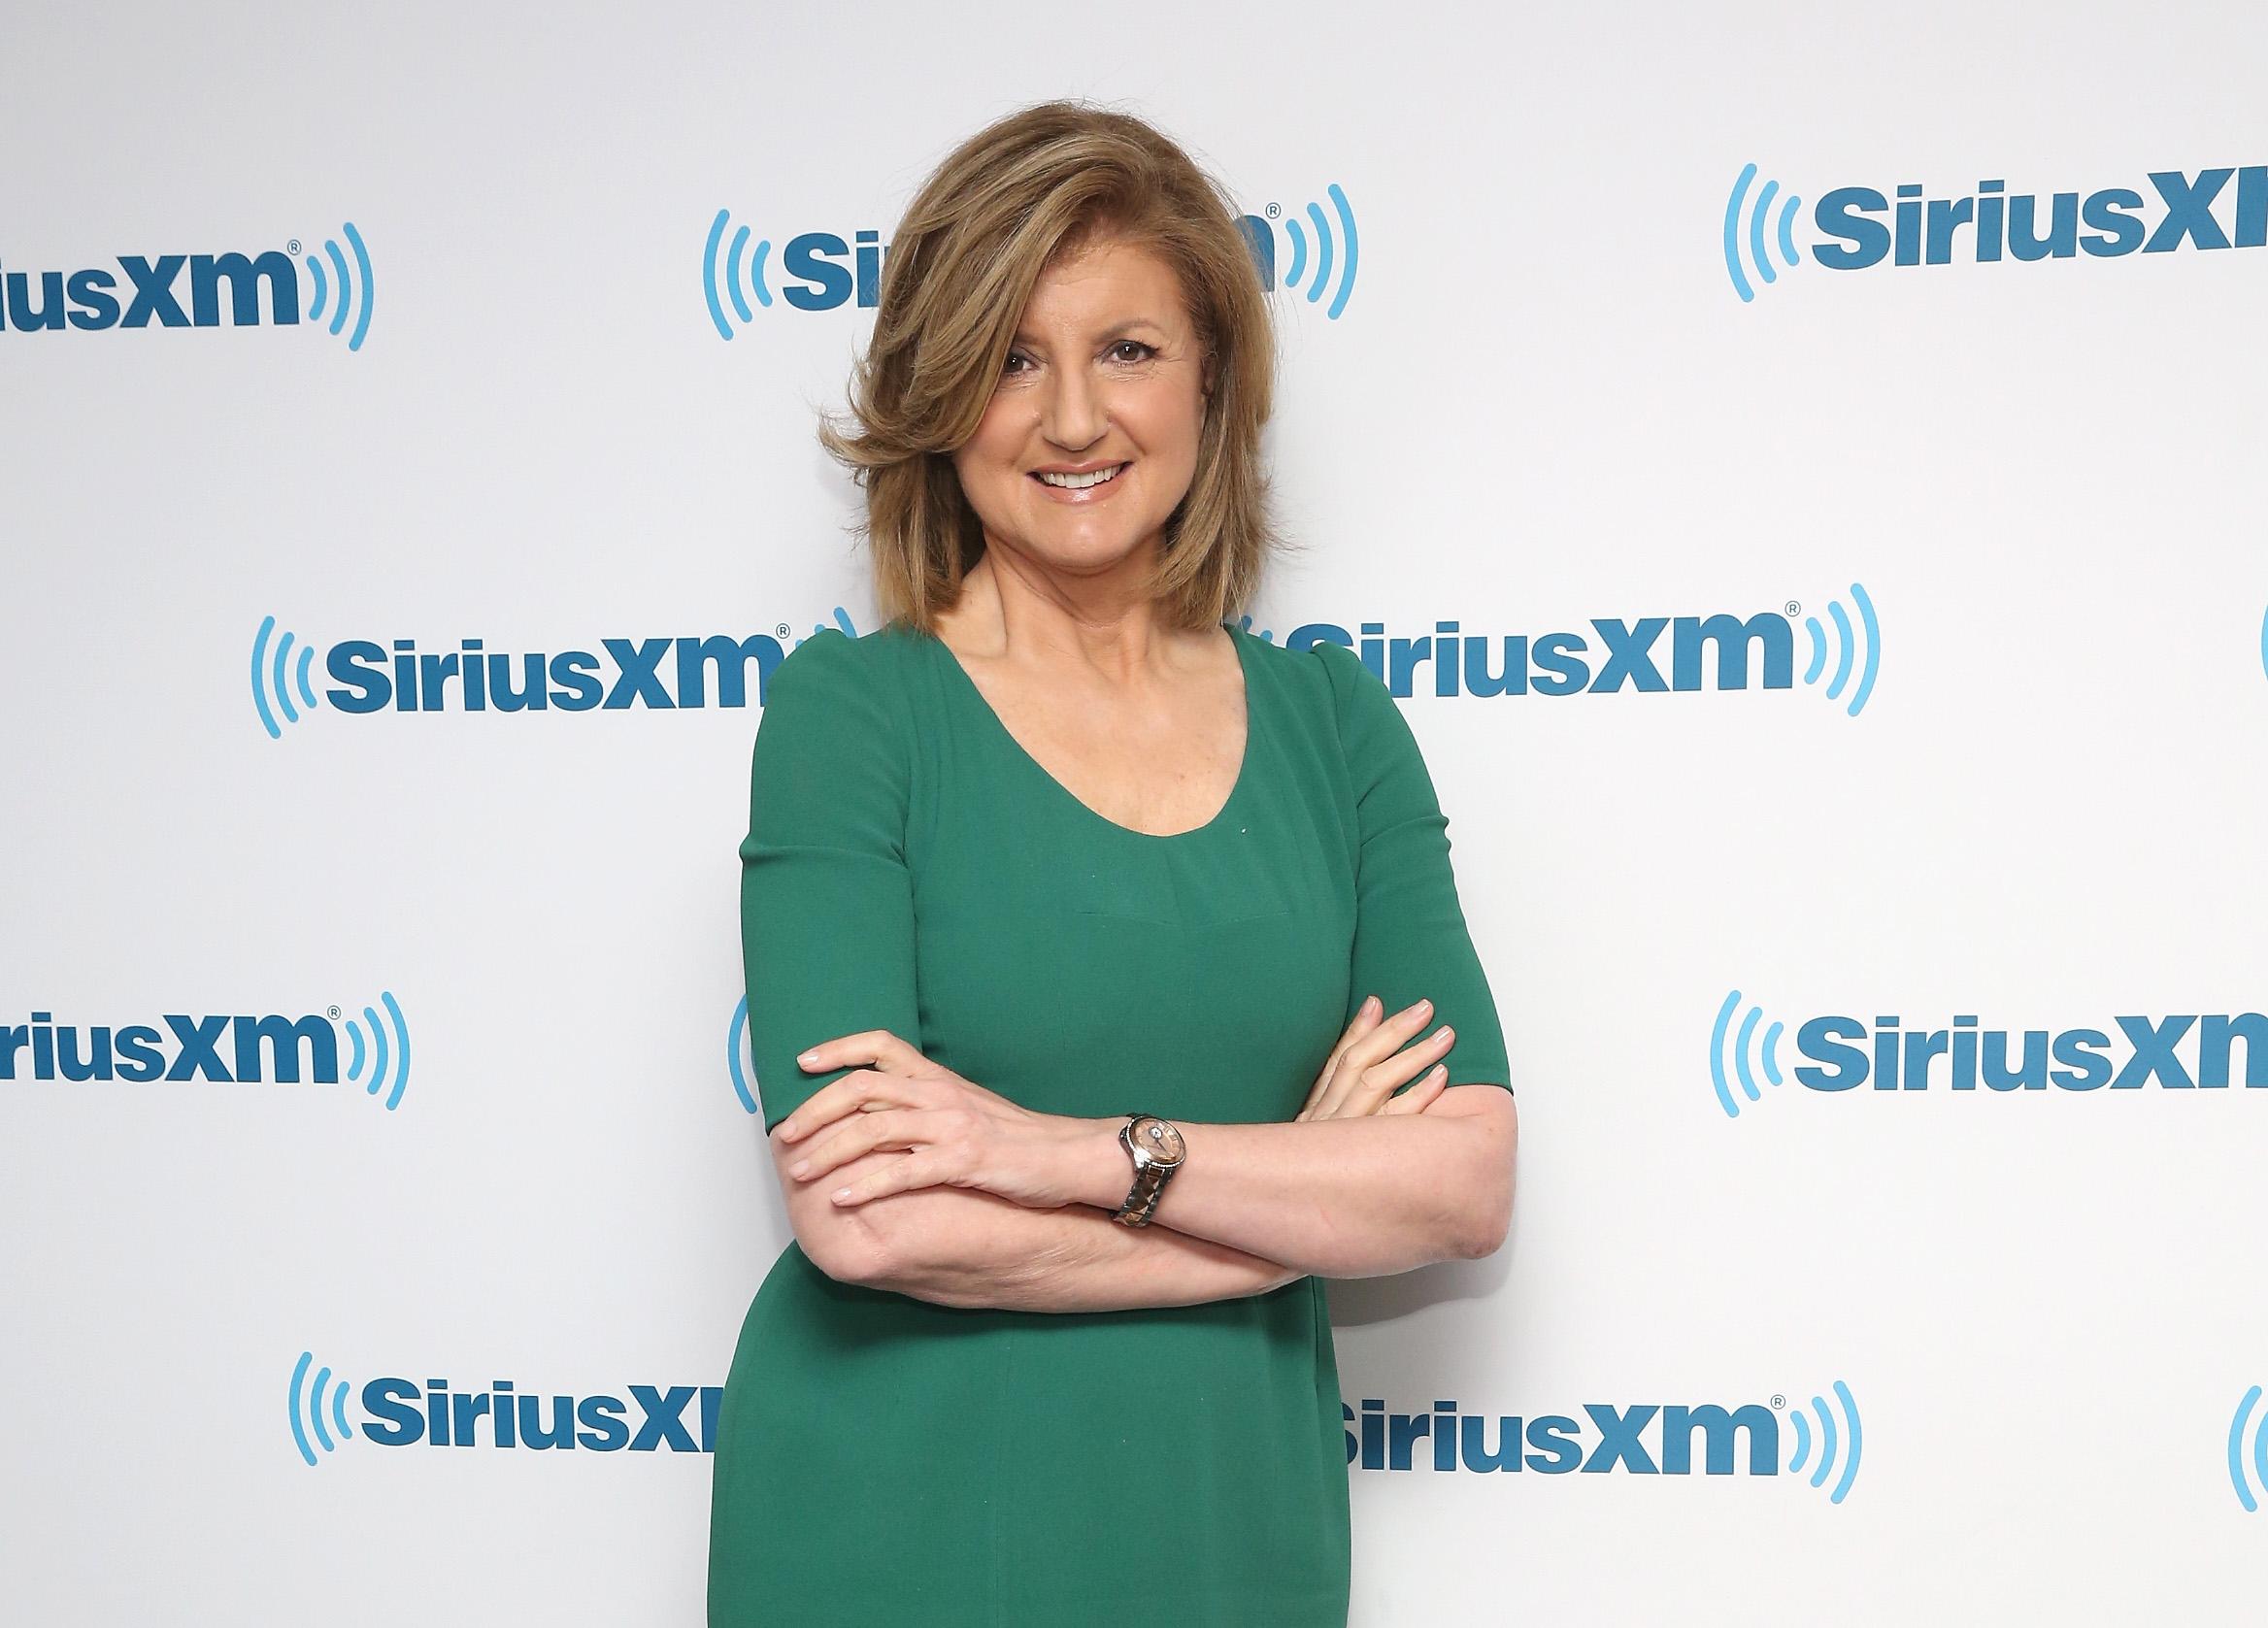 Arianna Huffington visits at SiriusXM Studio on April 26, 2016 in New York City.